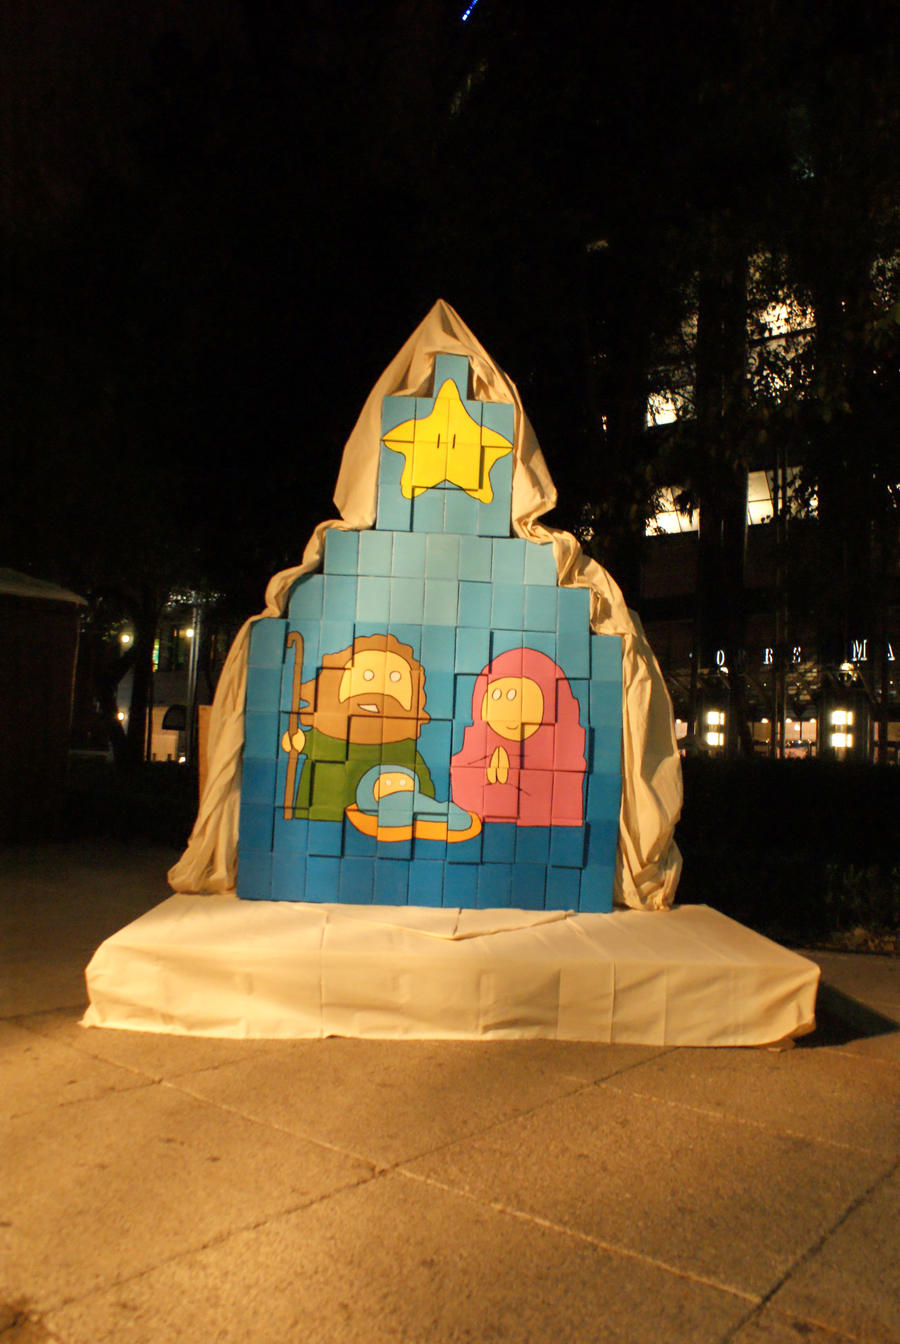 En Reforma 2 by Mataketa-azul